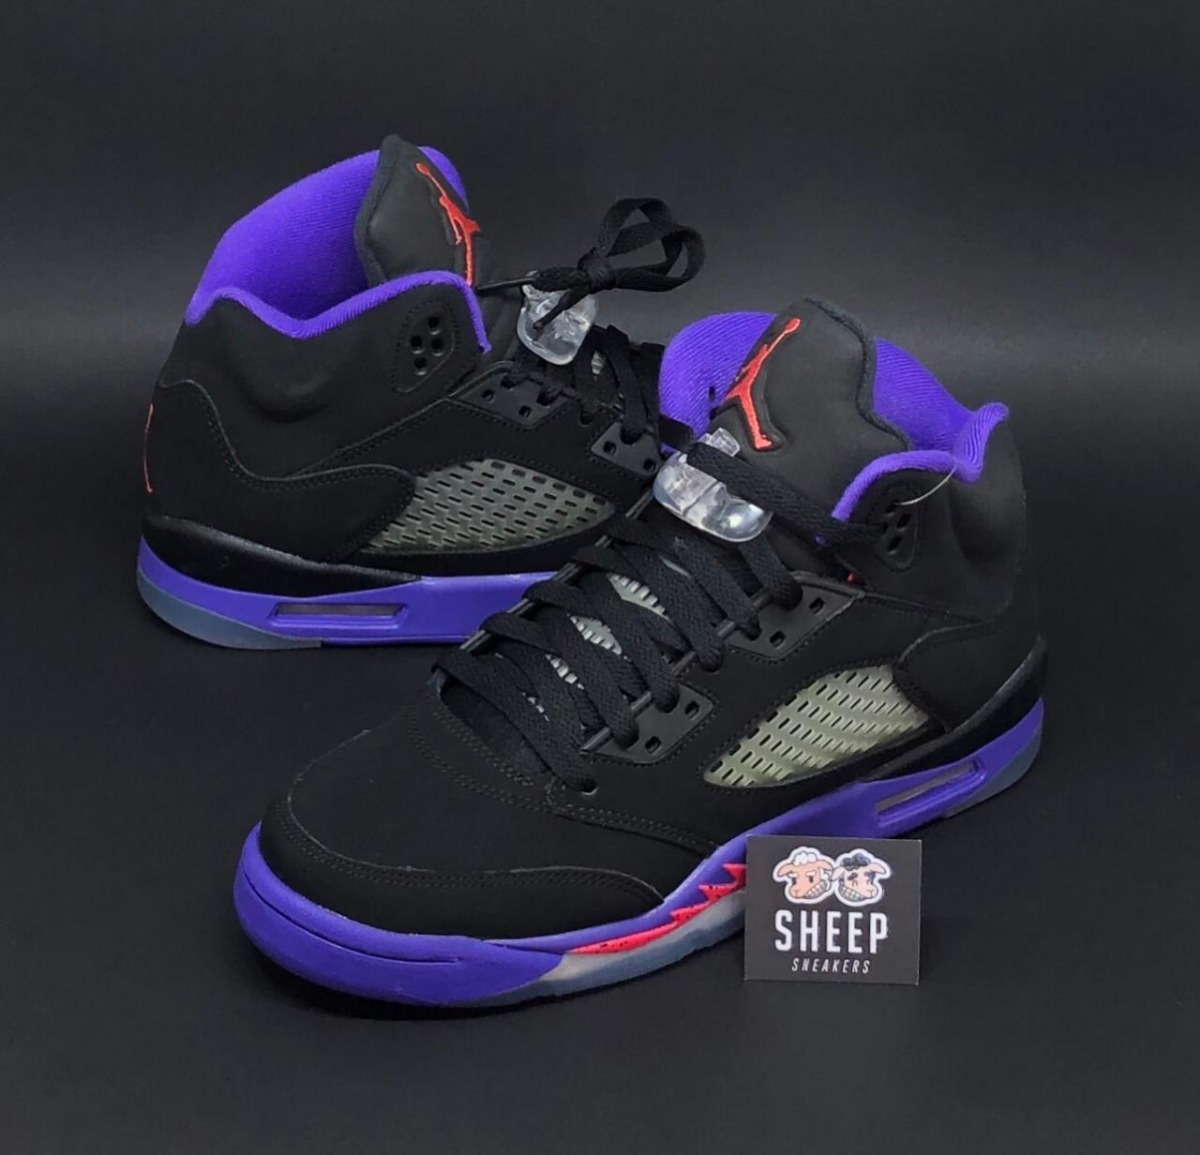 timeless design 3462b fe938 Tênis Nike Air Jordan 5 Gs Raptors